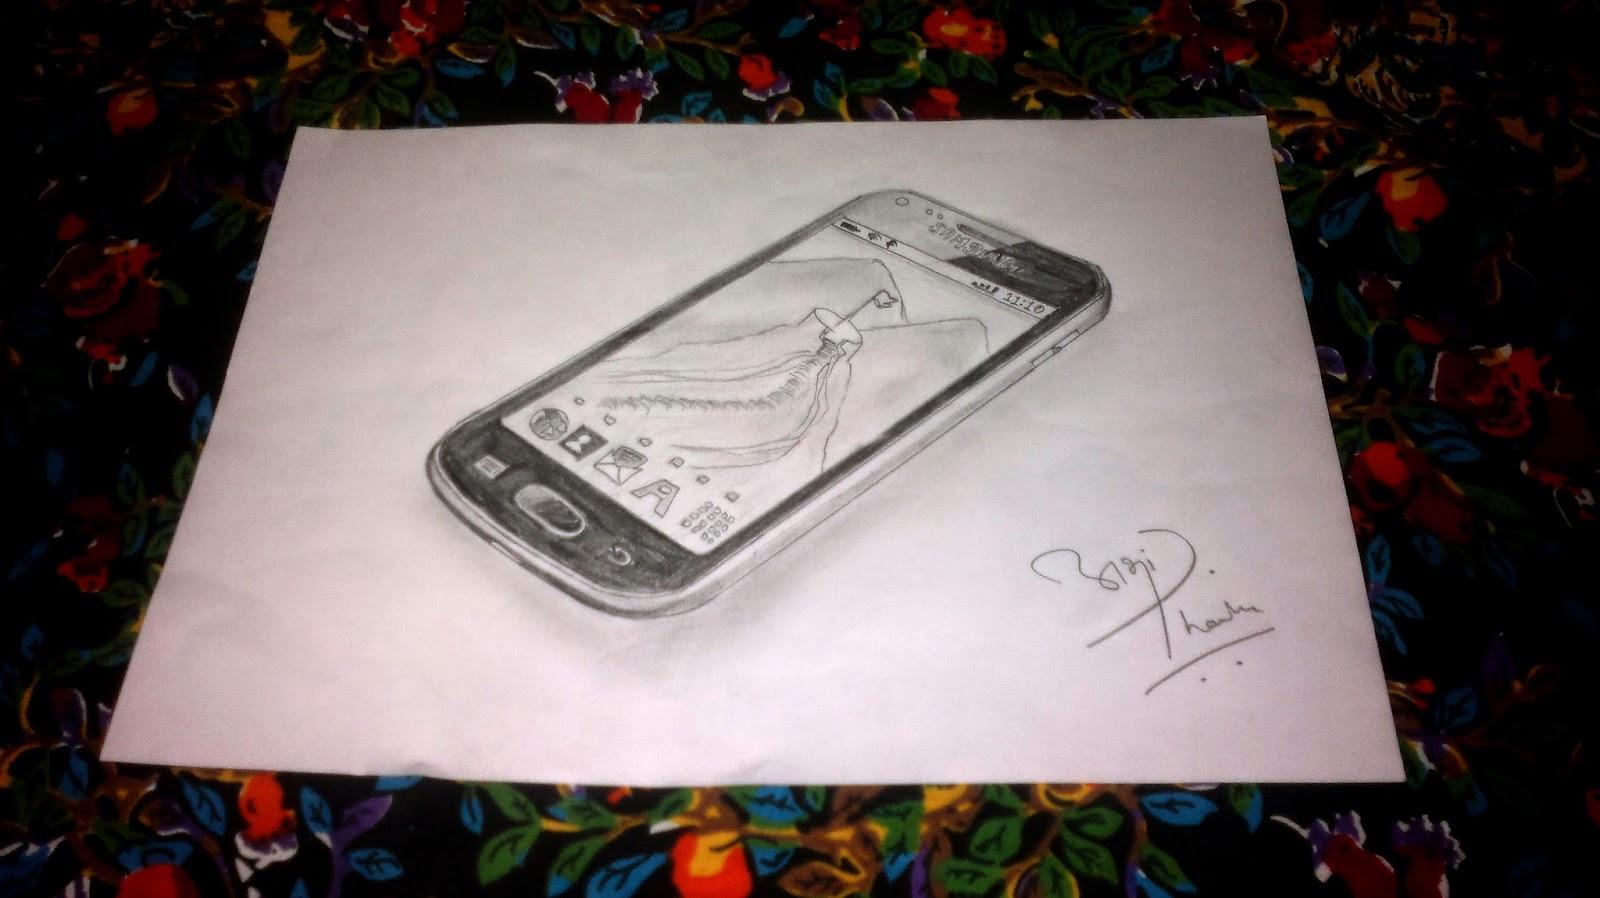 Galaxy S Duos Sketch by Abhishek Thamke